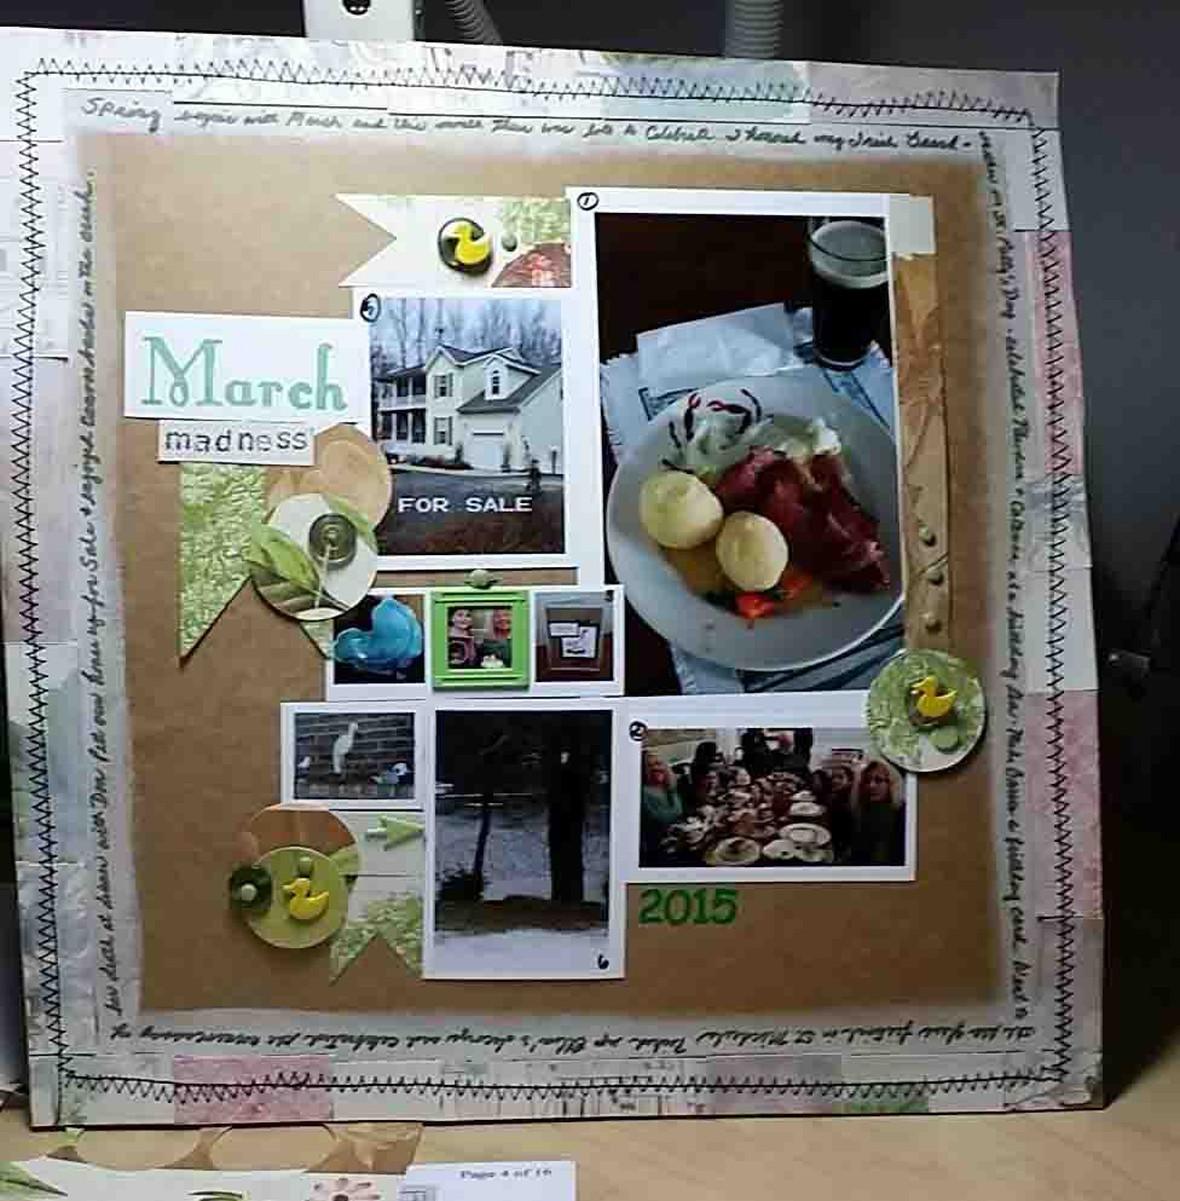 Marchscrapbookpage edited 2 original